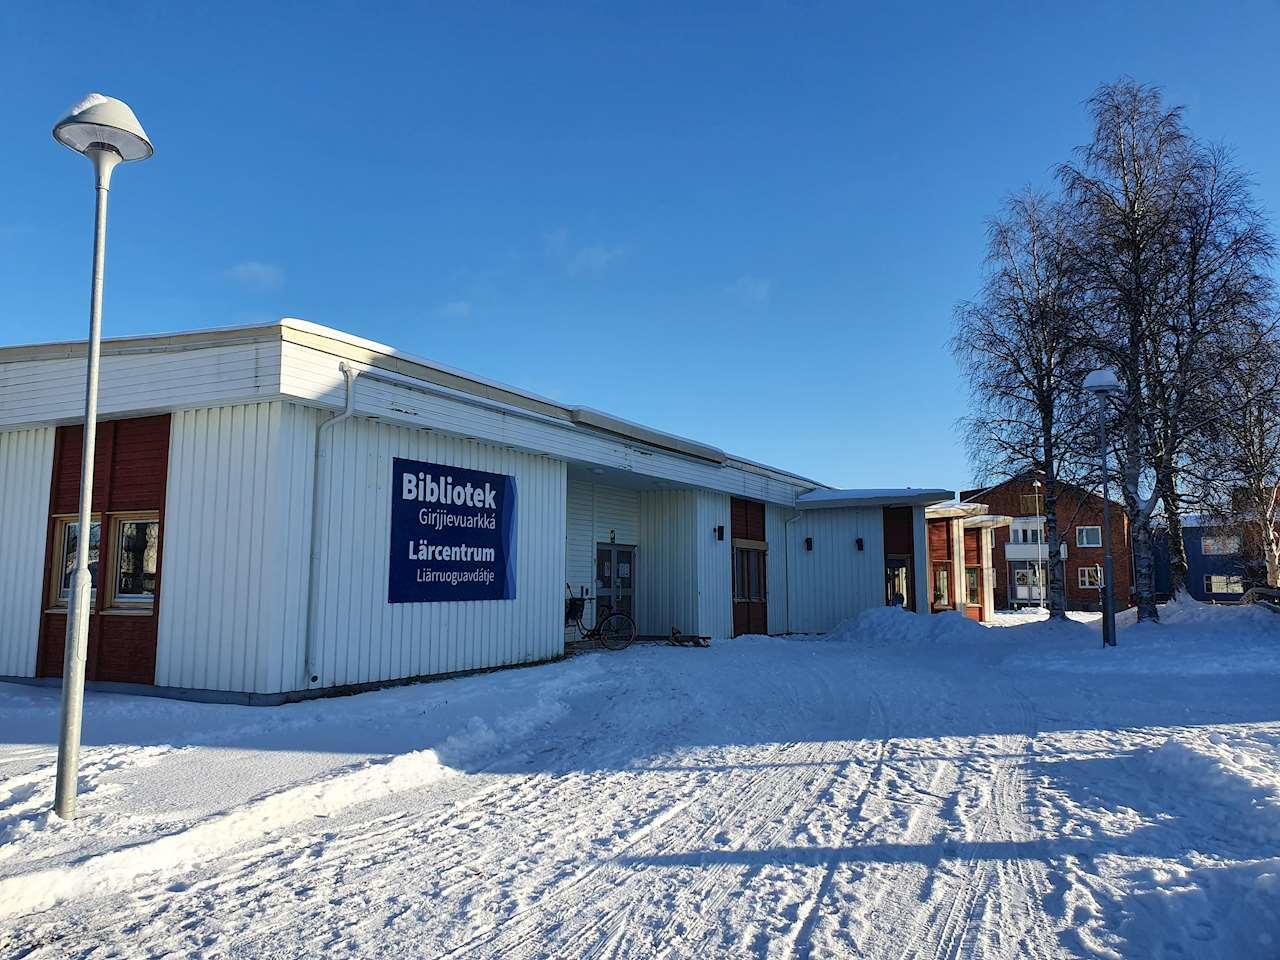 Sorsele biblioteks fasad en vinterdag